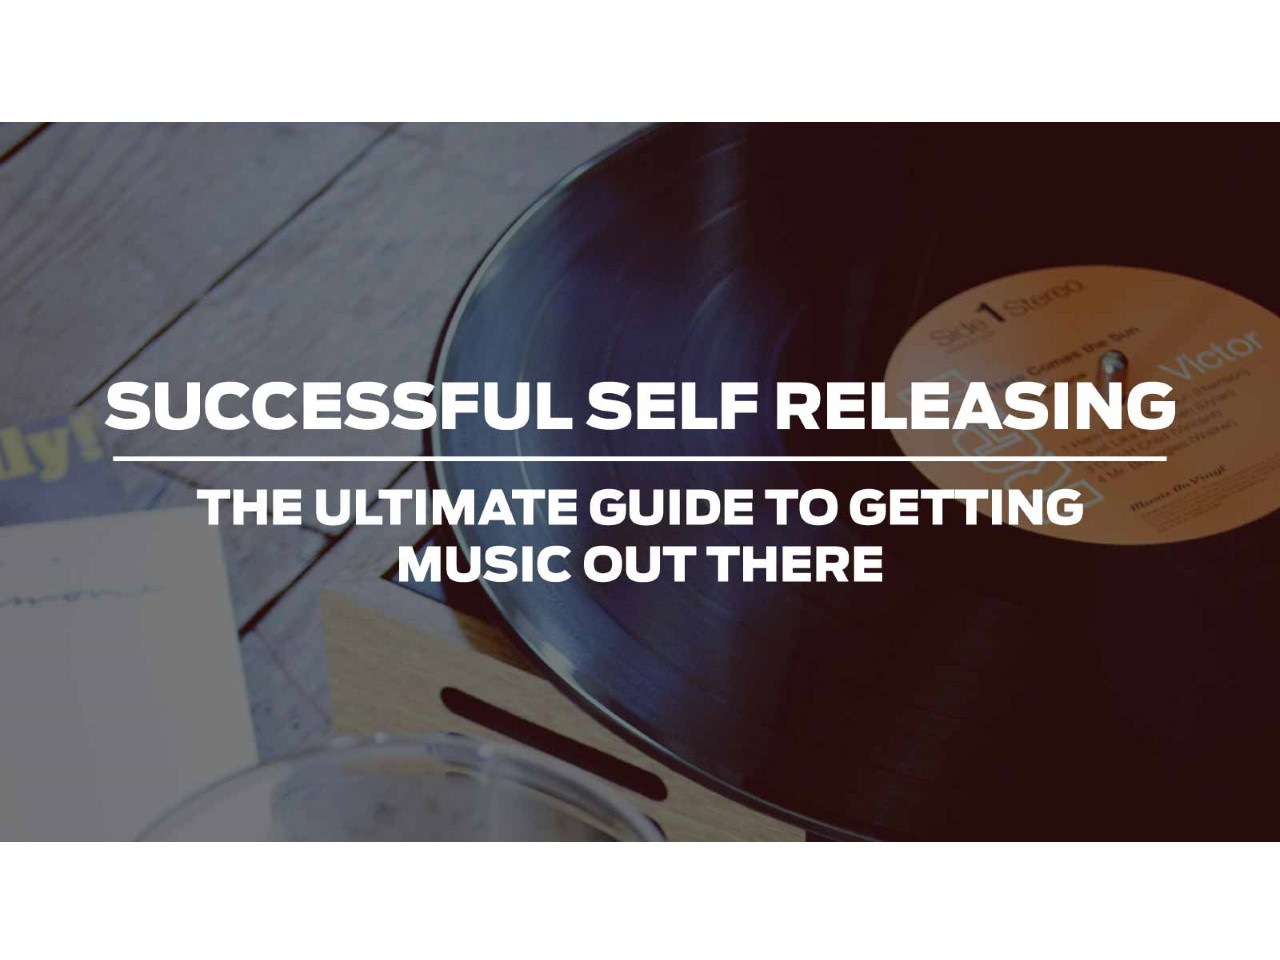 successful self releasing music course